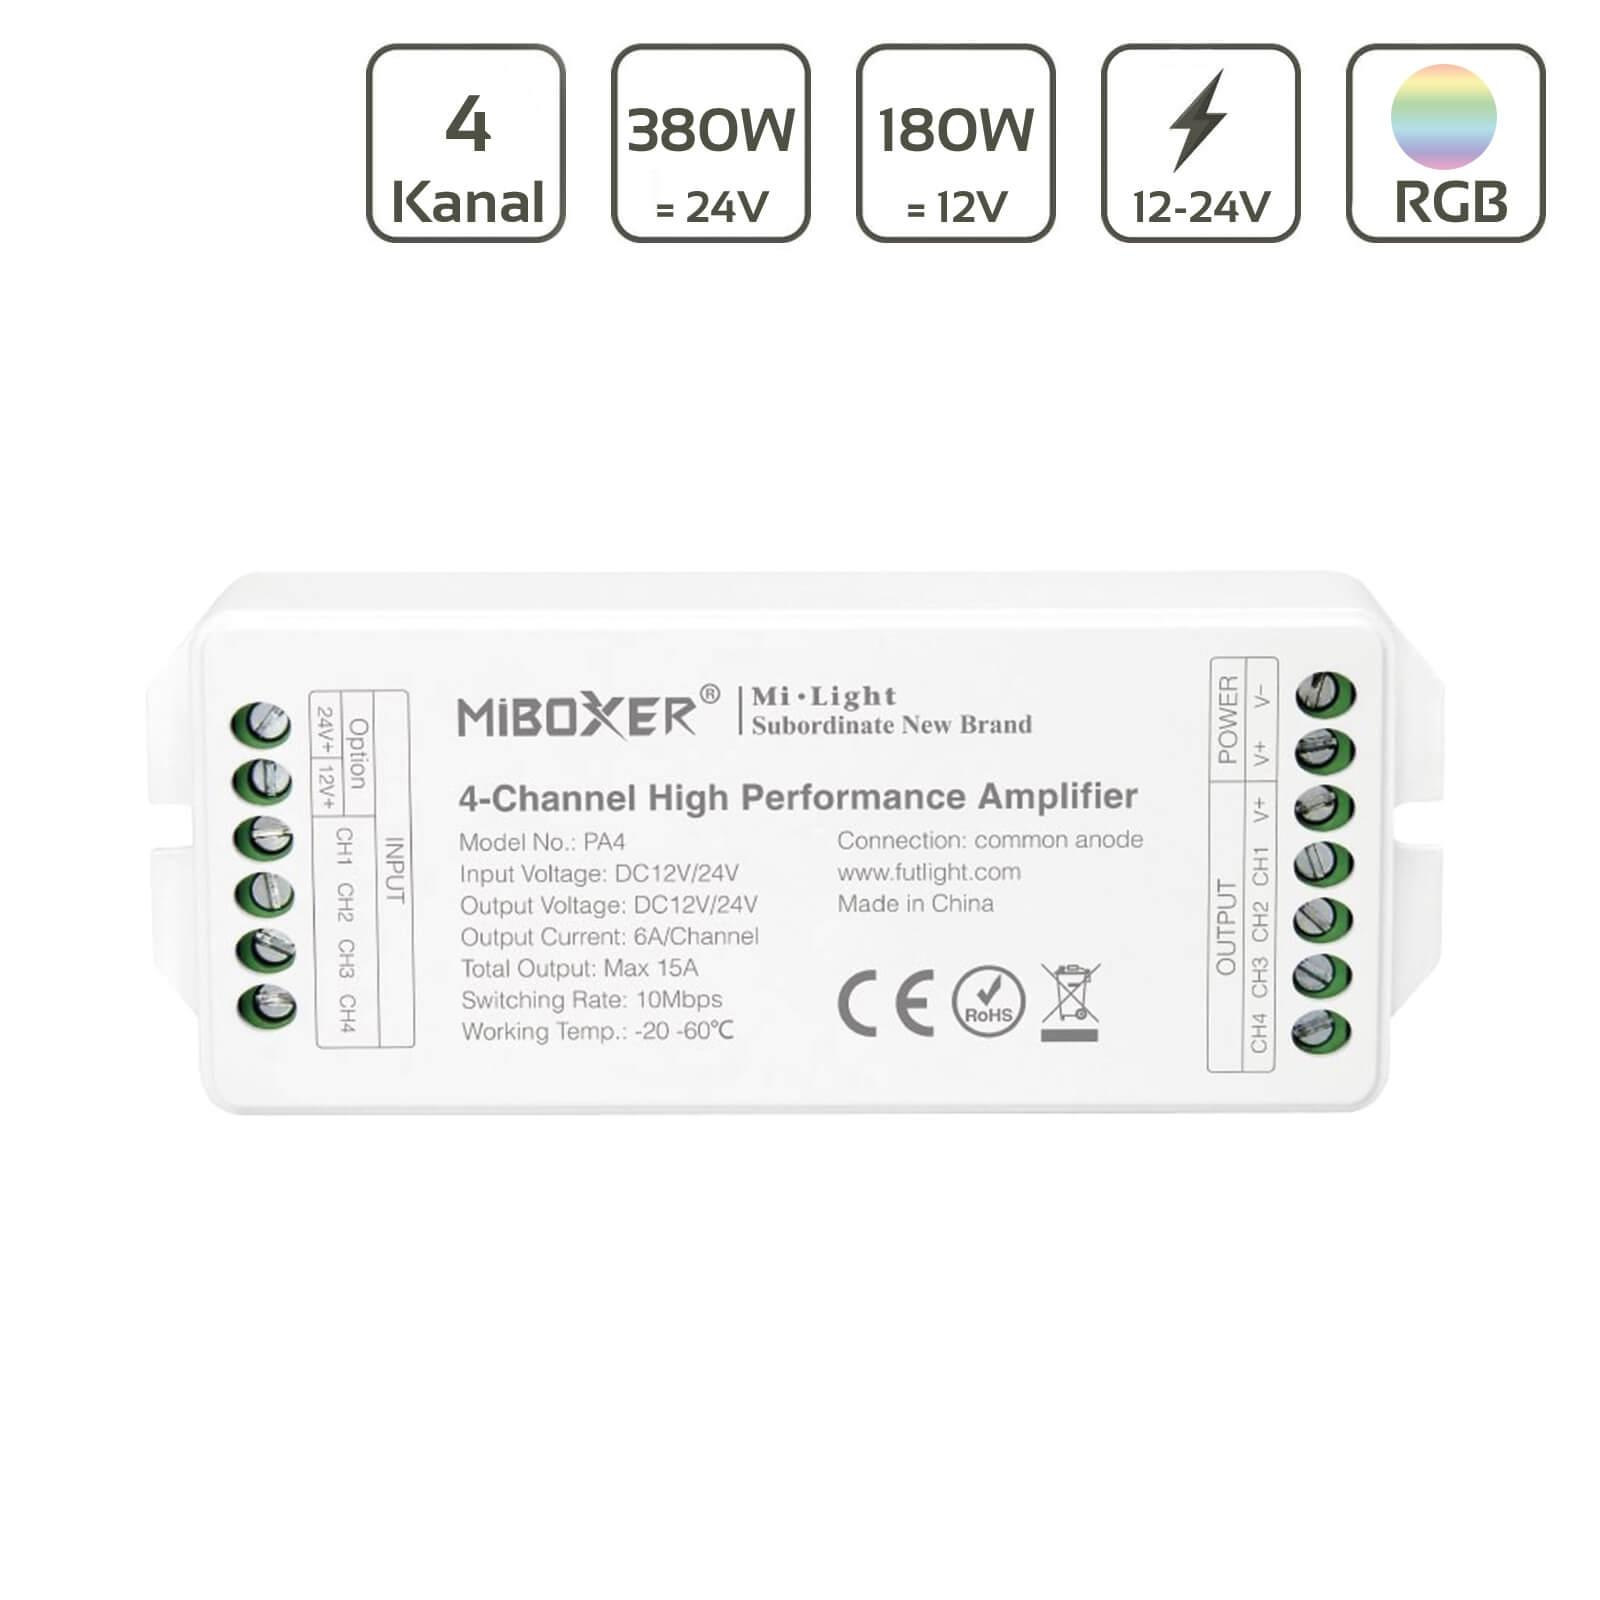 MiBoxer RGBW Verstärker/Amplifier 4 Kanal 12/24V PA4